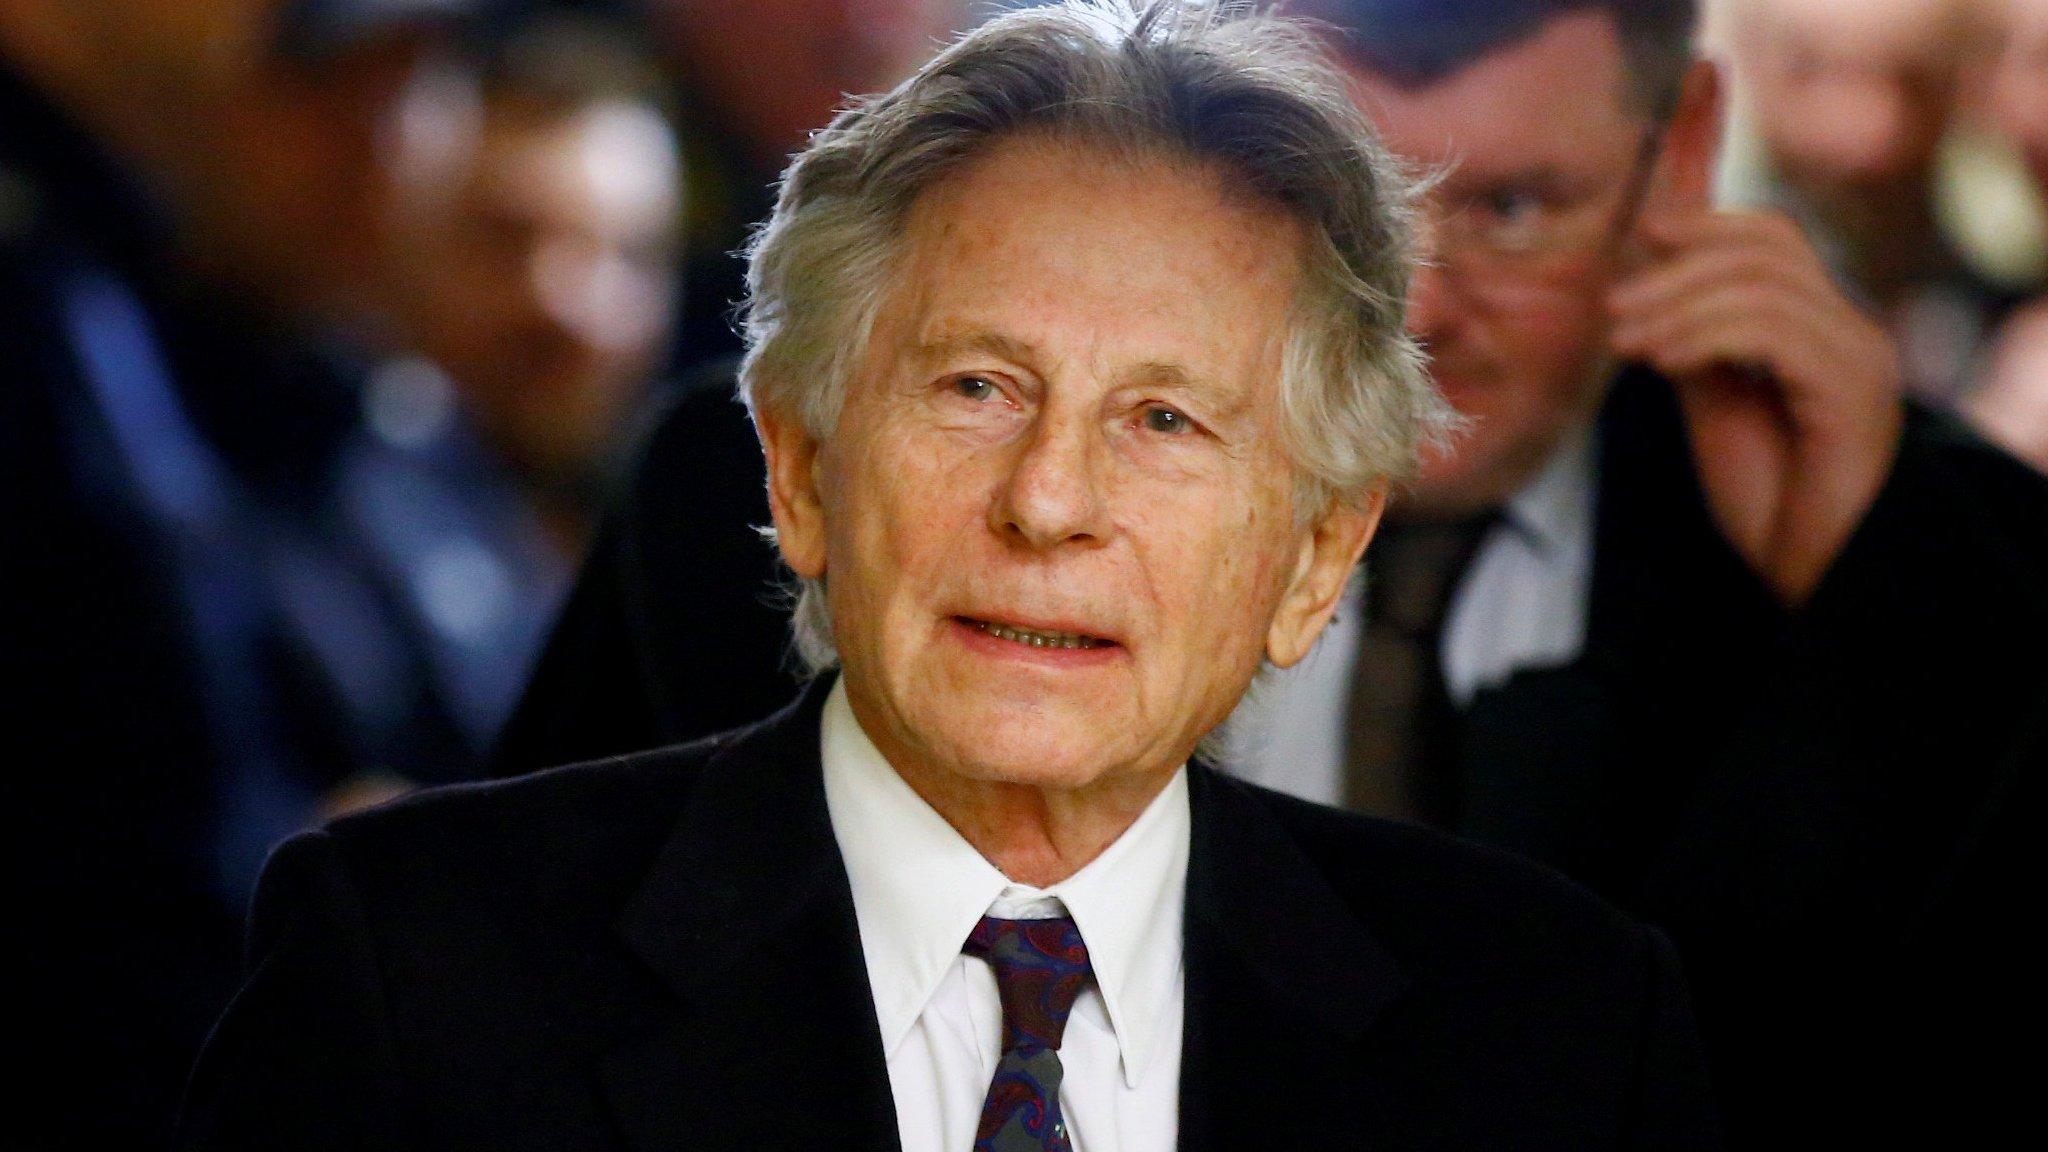 Roman Polanski picked for French film panel, sparking outrage